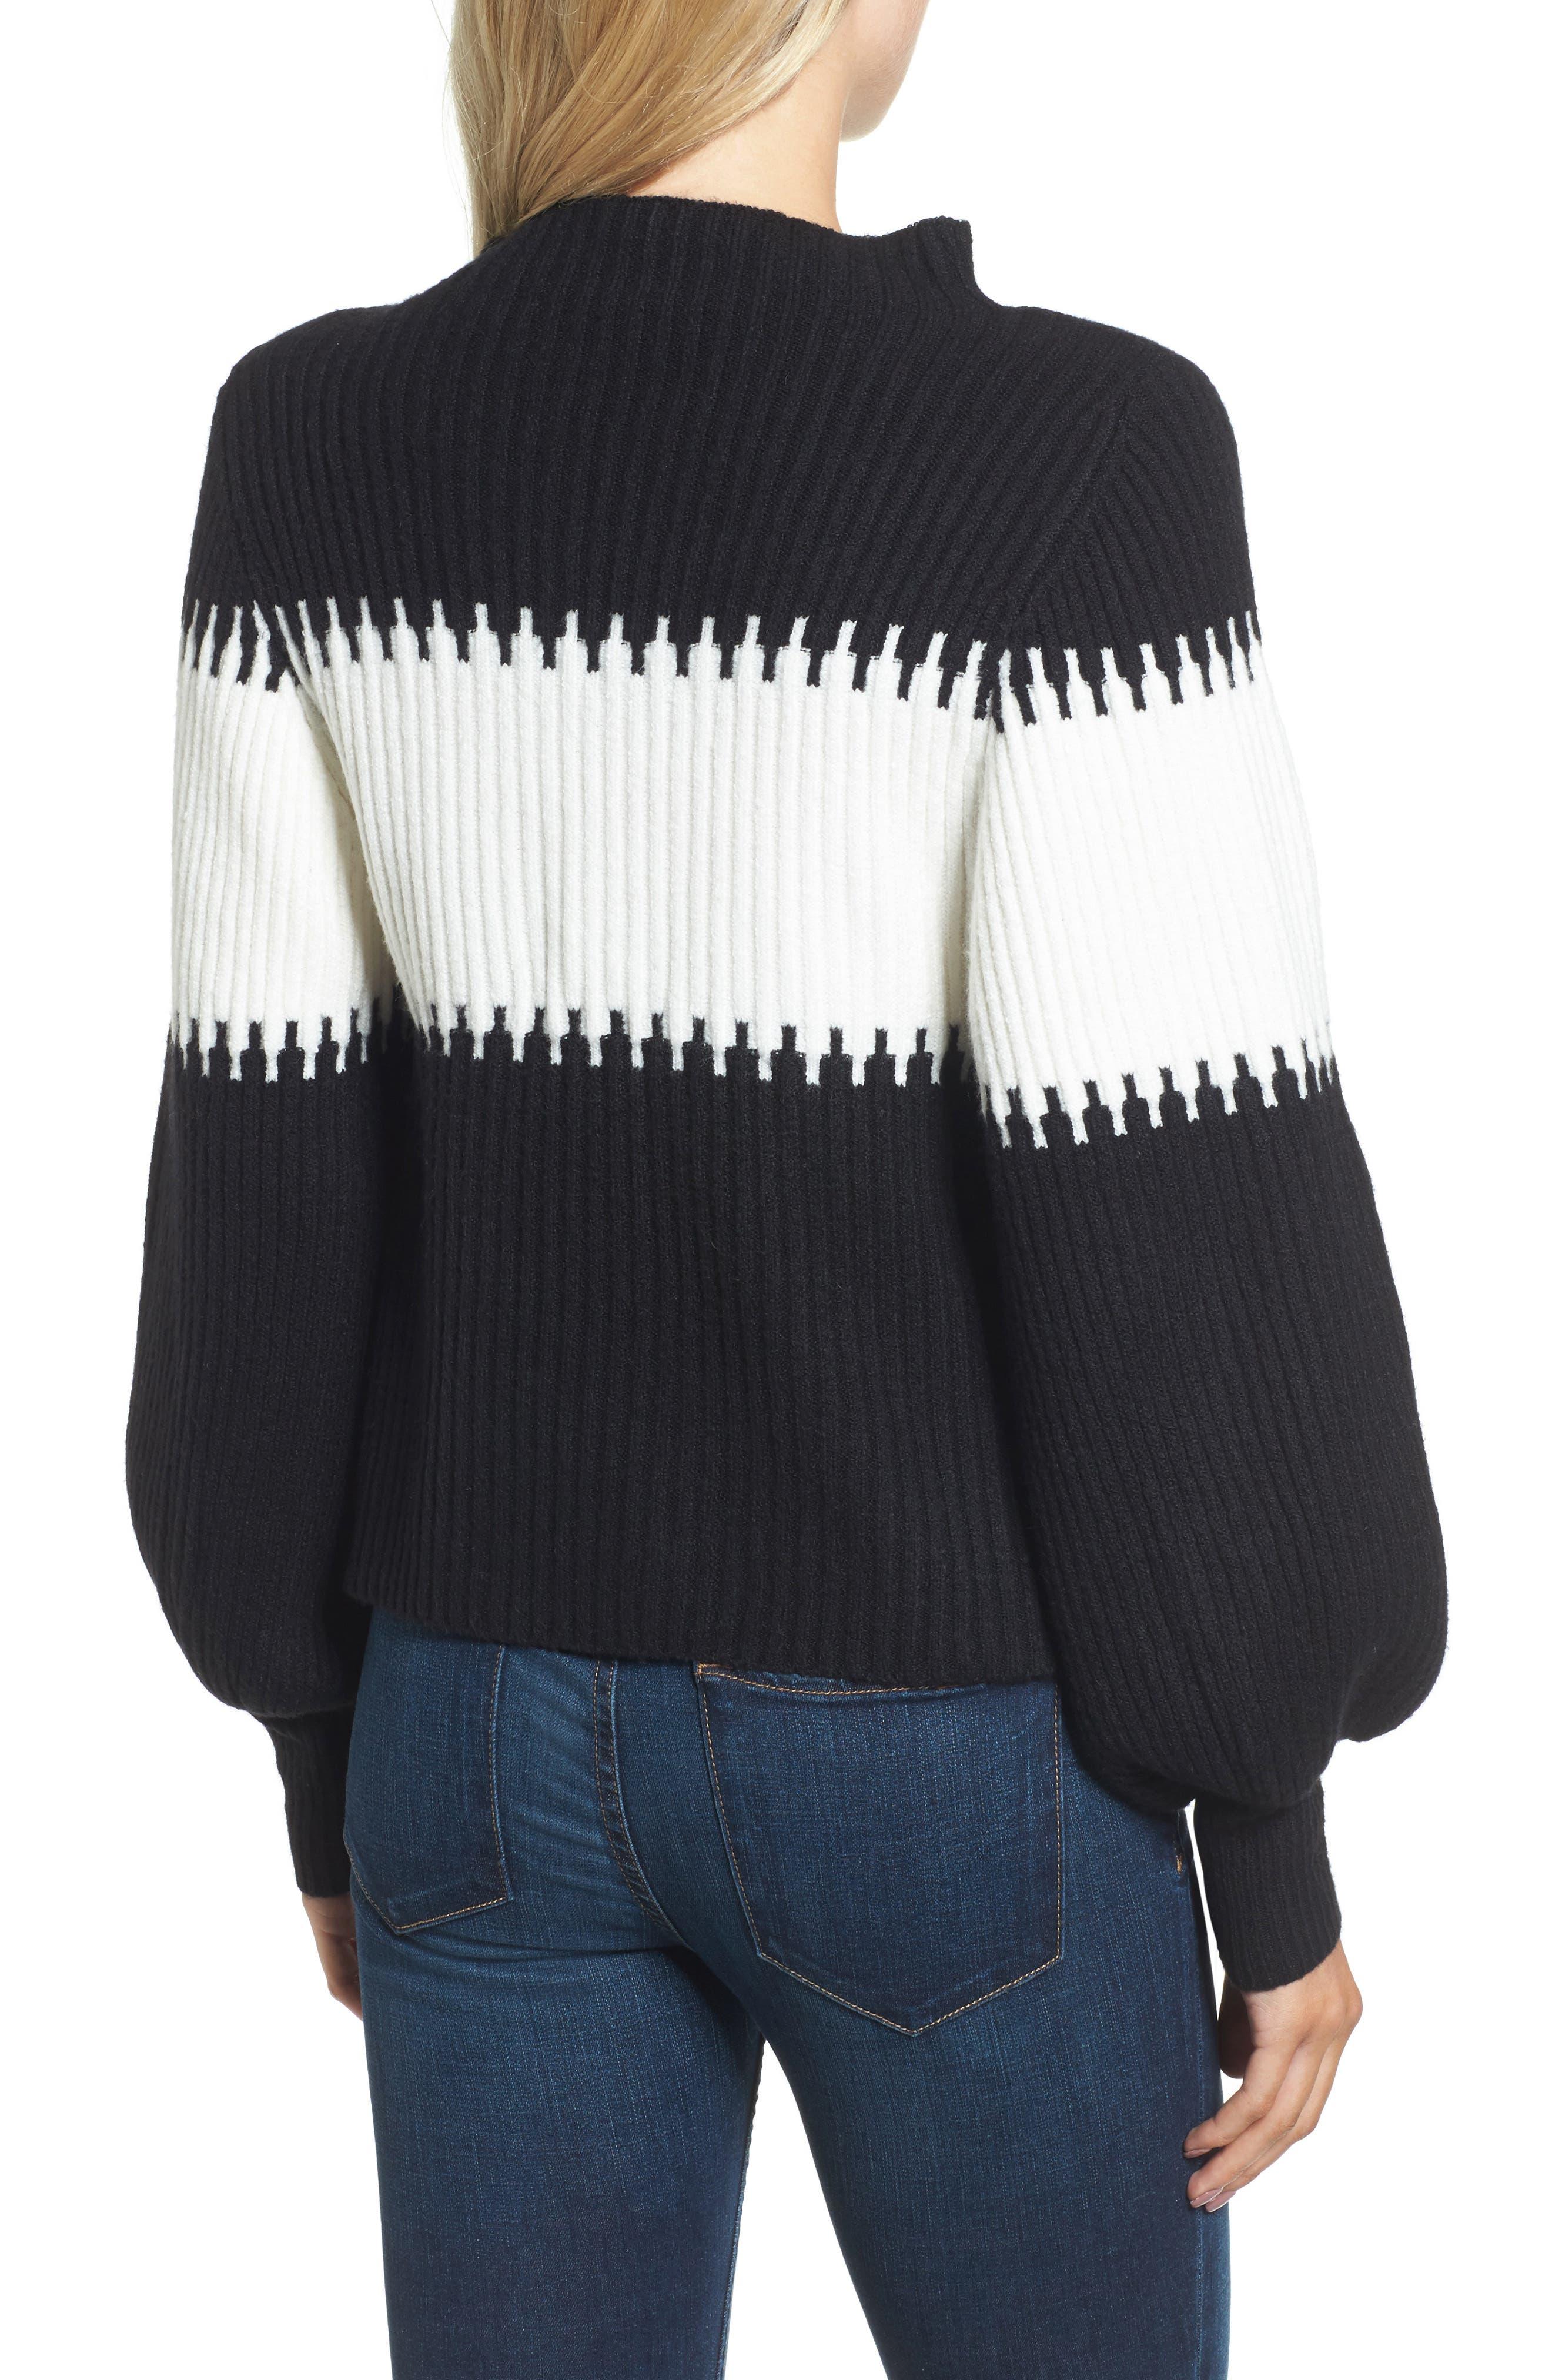 Sofia Puff Sleeve Sweater,                             Alternate thumbnail 2, color,                             001